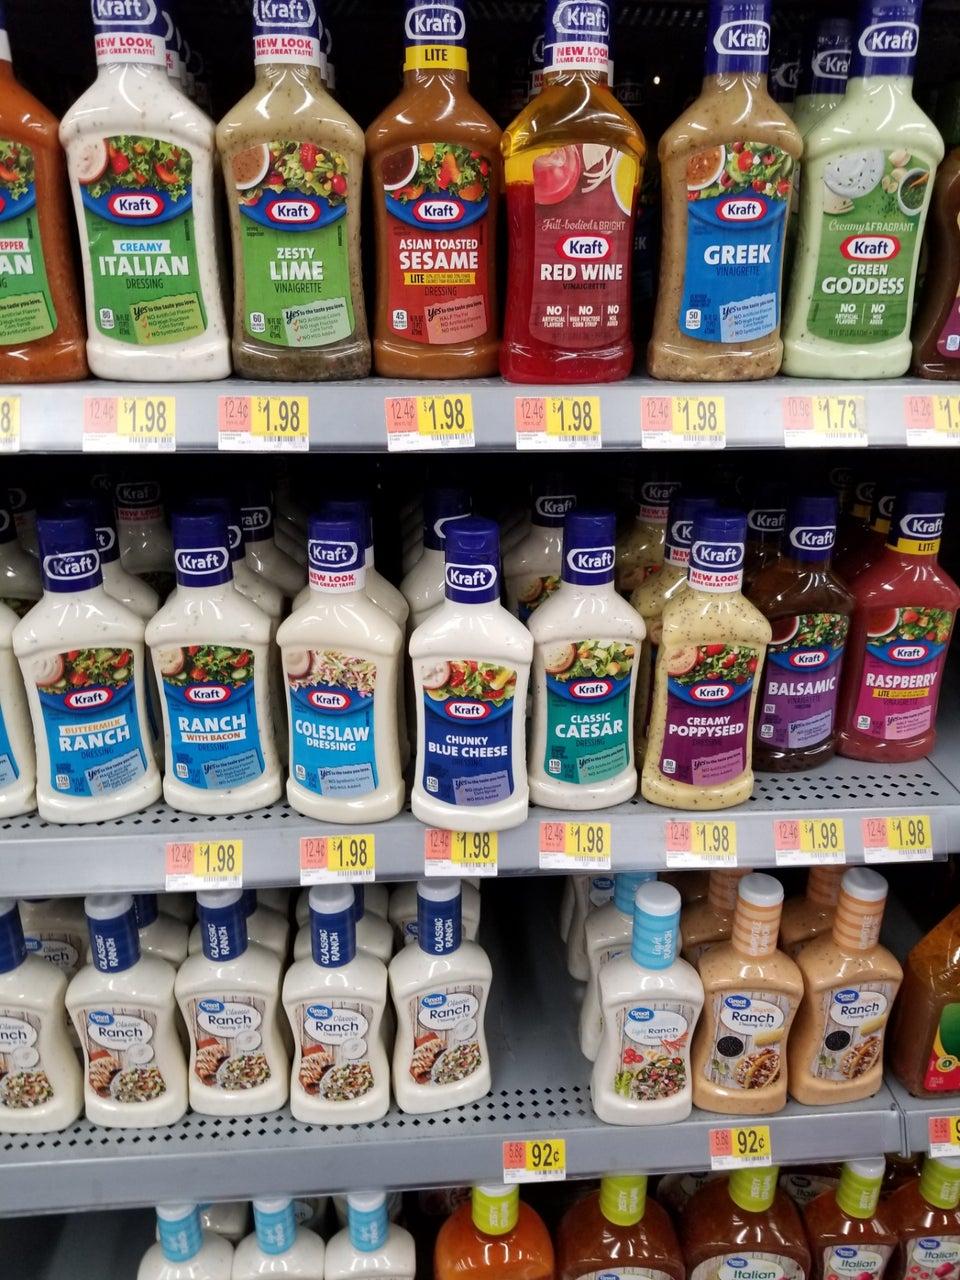 Walmart Winston-Salem